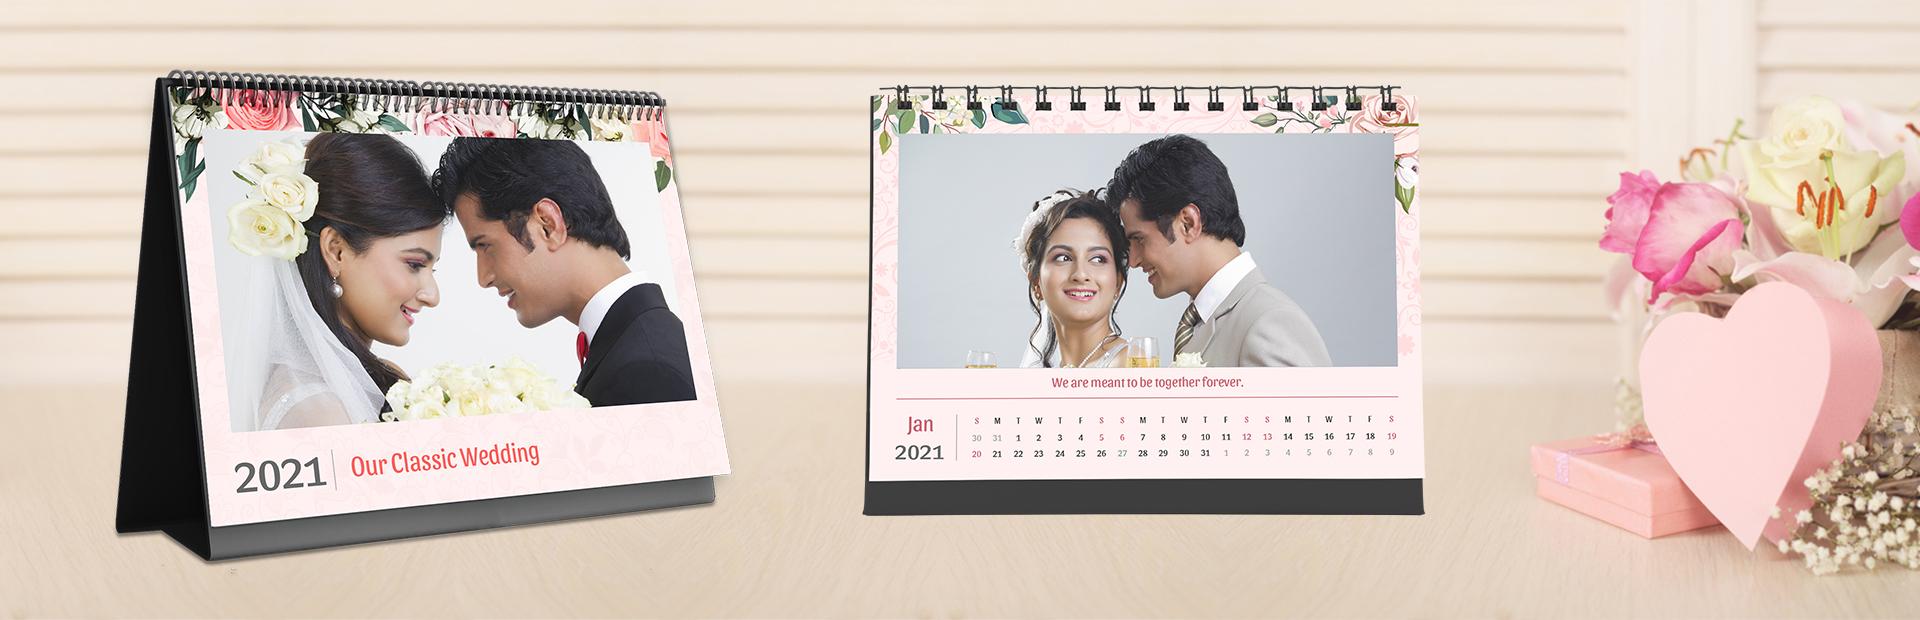 Wedding Classic Photo Calendars Online